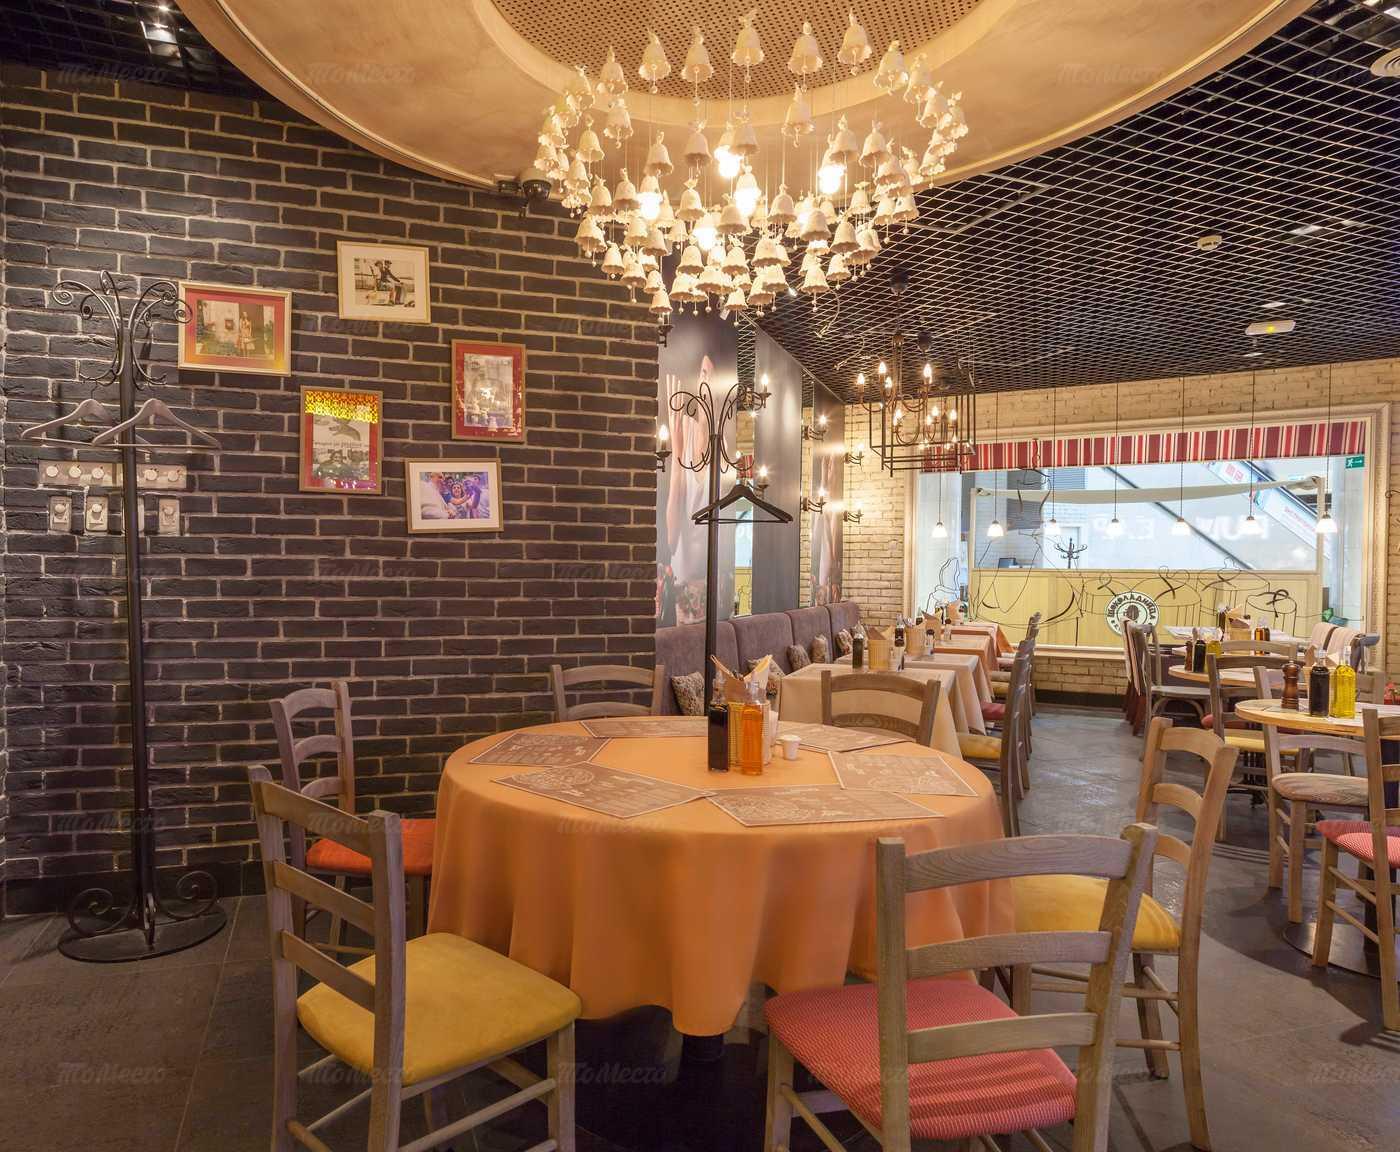 Меню кафе, ресторана Osteria Mario на Манежной площади